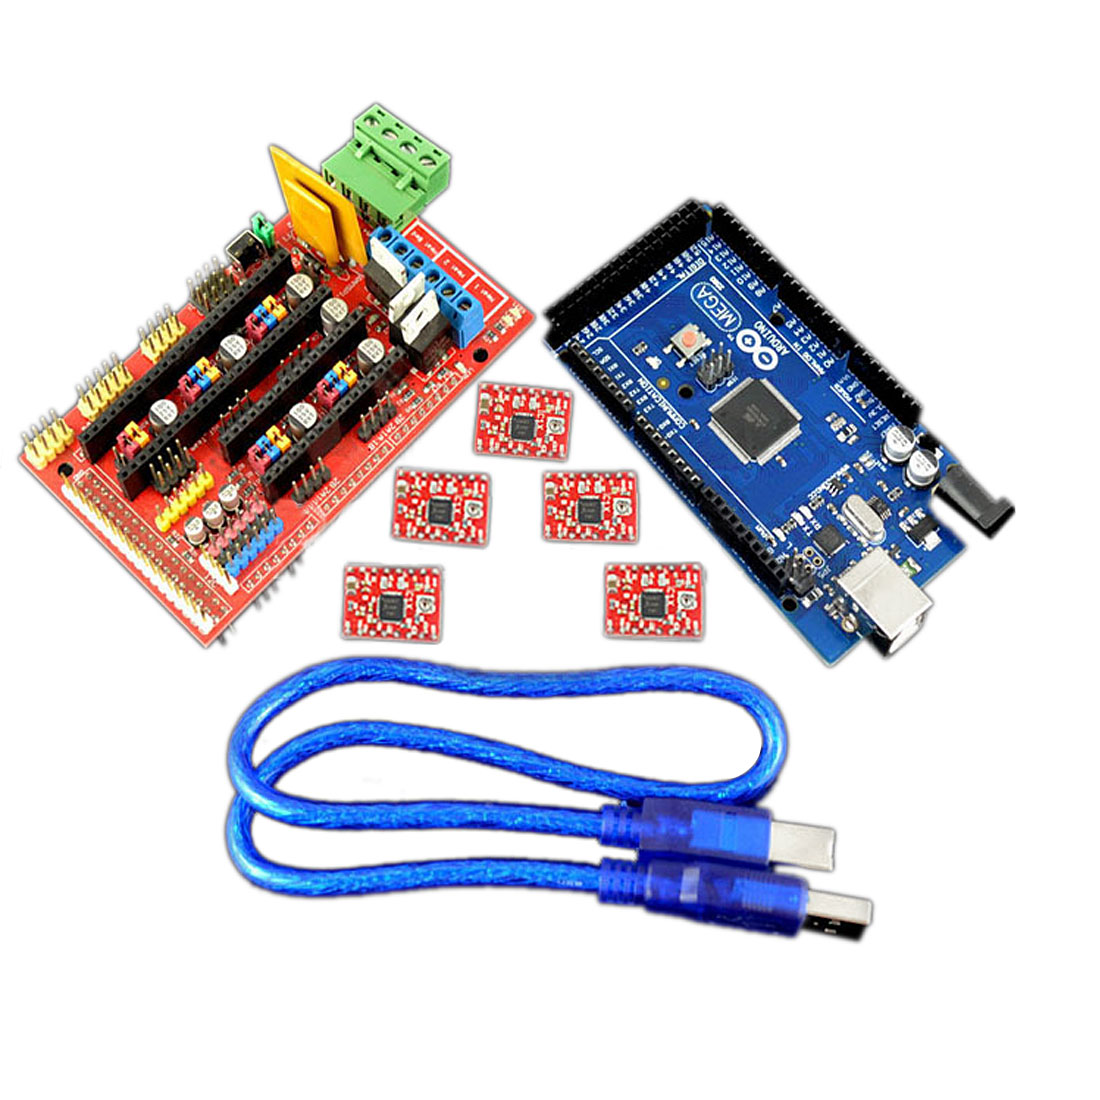 Reprap Ramps 1.4 w Mega2560R3 Control Board w A4988 Driver Heatsink 3D Printer Controller Kit